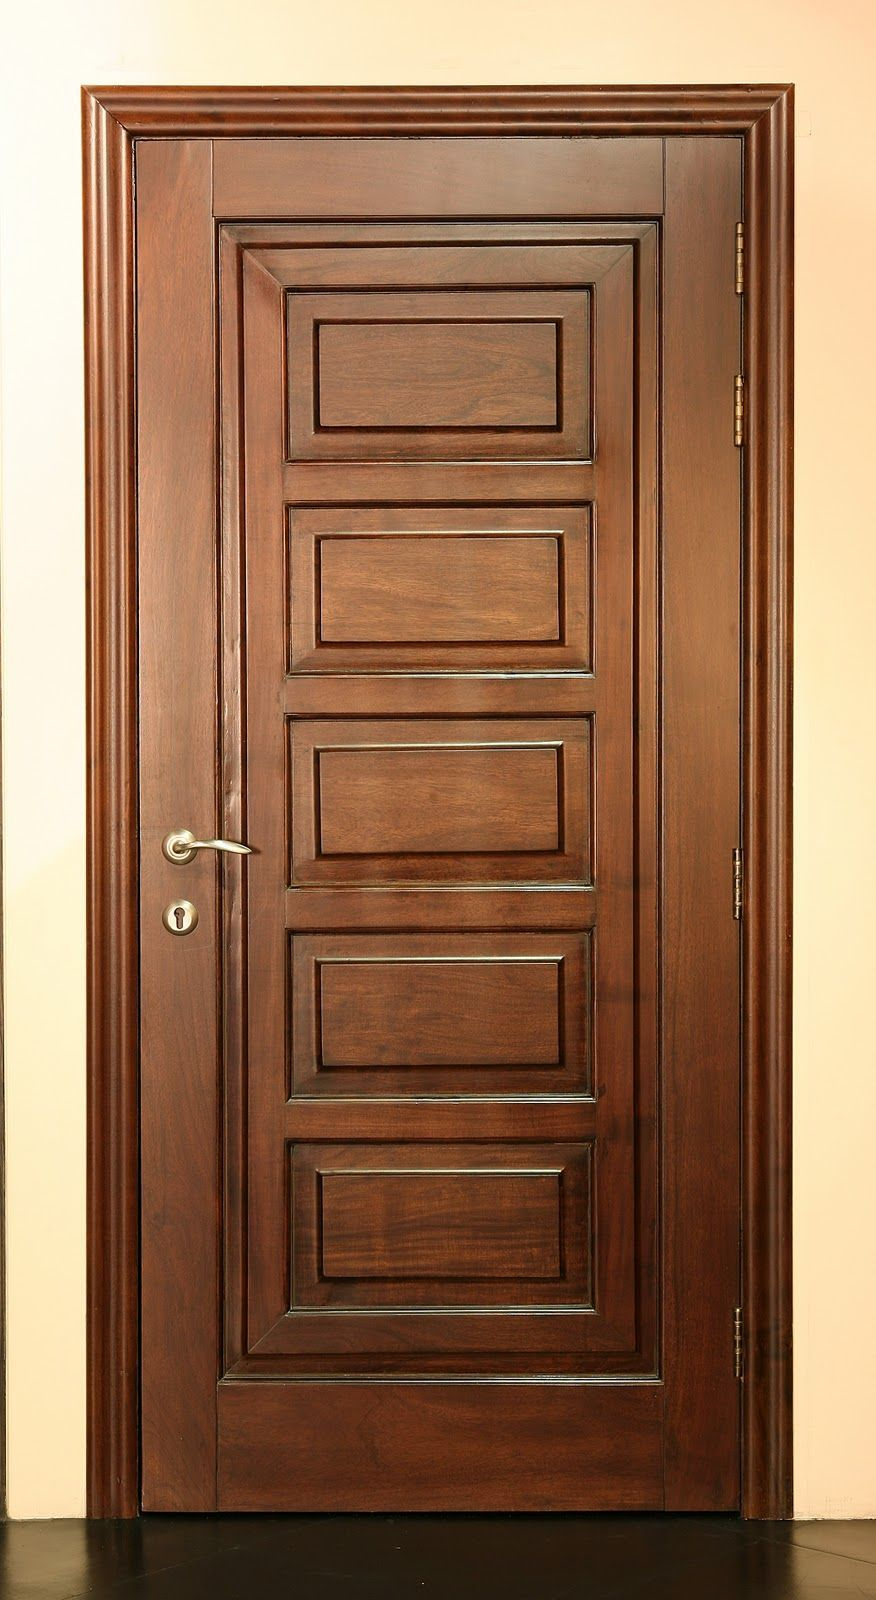 71 Reference Of Door Design For Bedroom In India 71 Reference Of Door Design For Bedroom In I Wooden Door Design Modern Wooden Doors Wooden Doors Interior